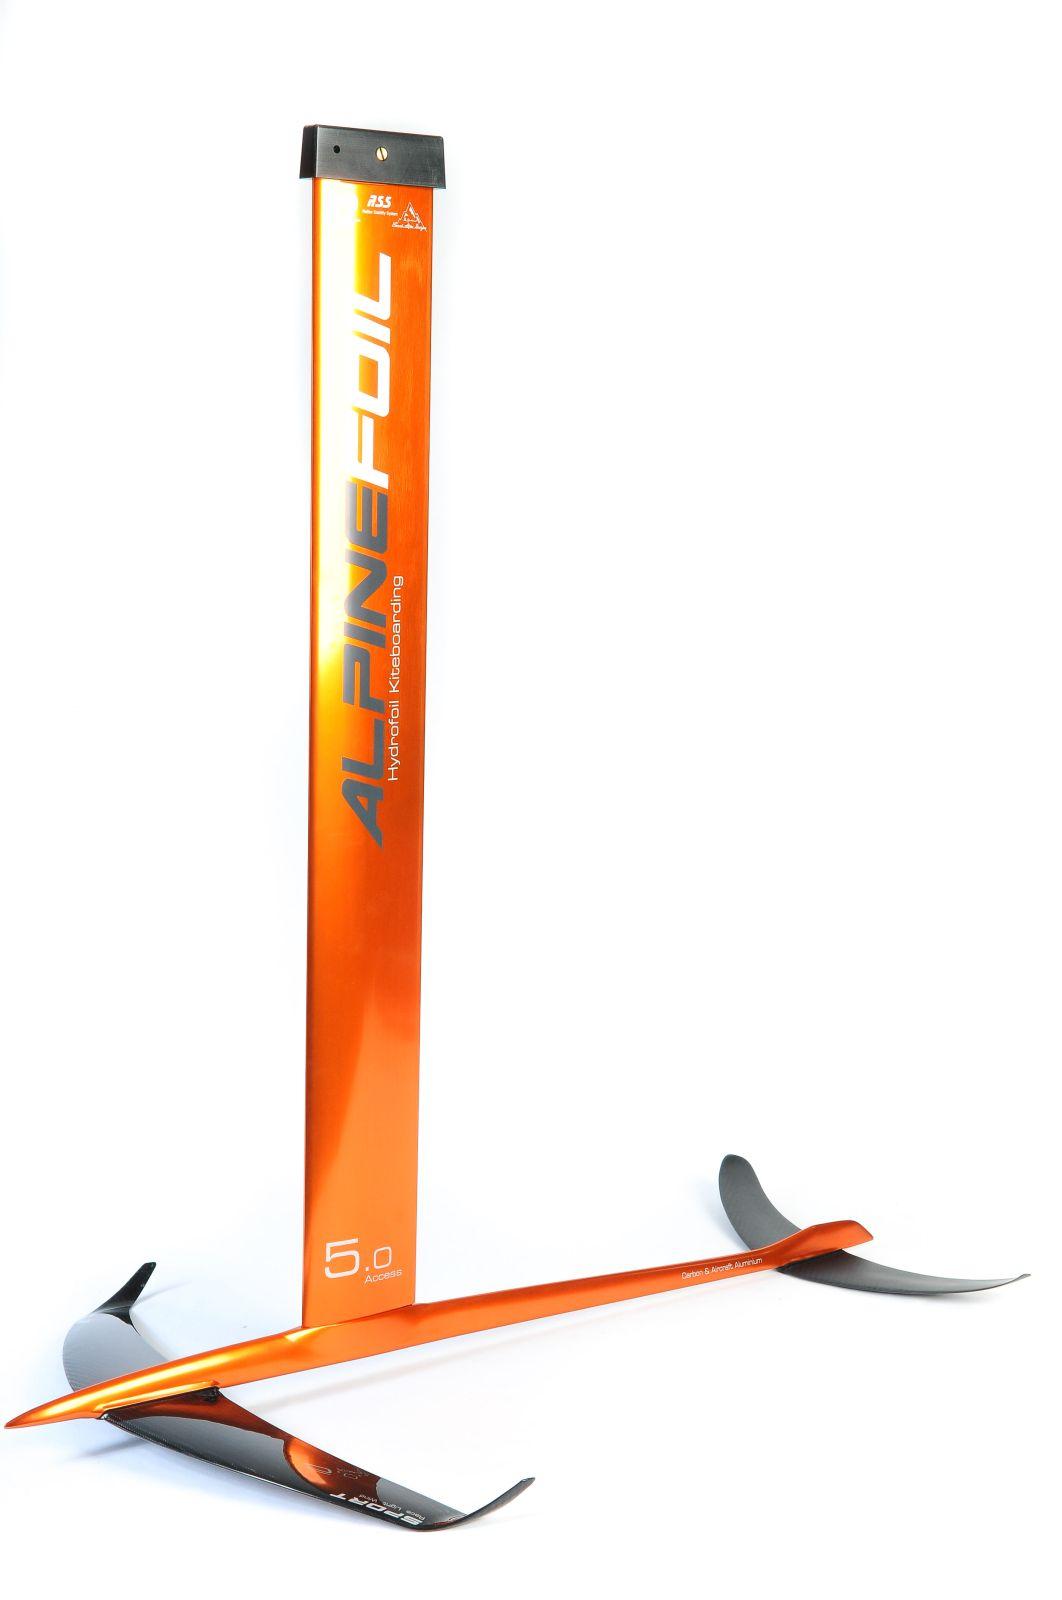 Kitefoil carbon aluminium alpinefoil 5 0 access v2 3398 1